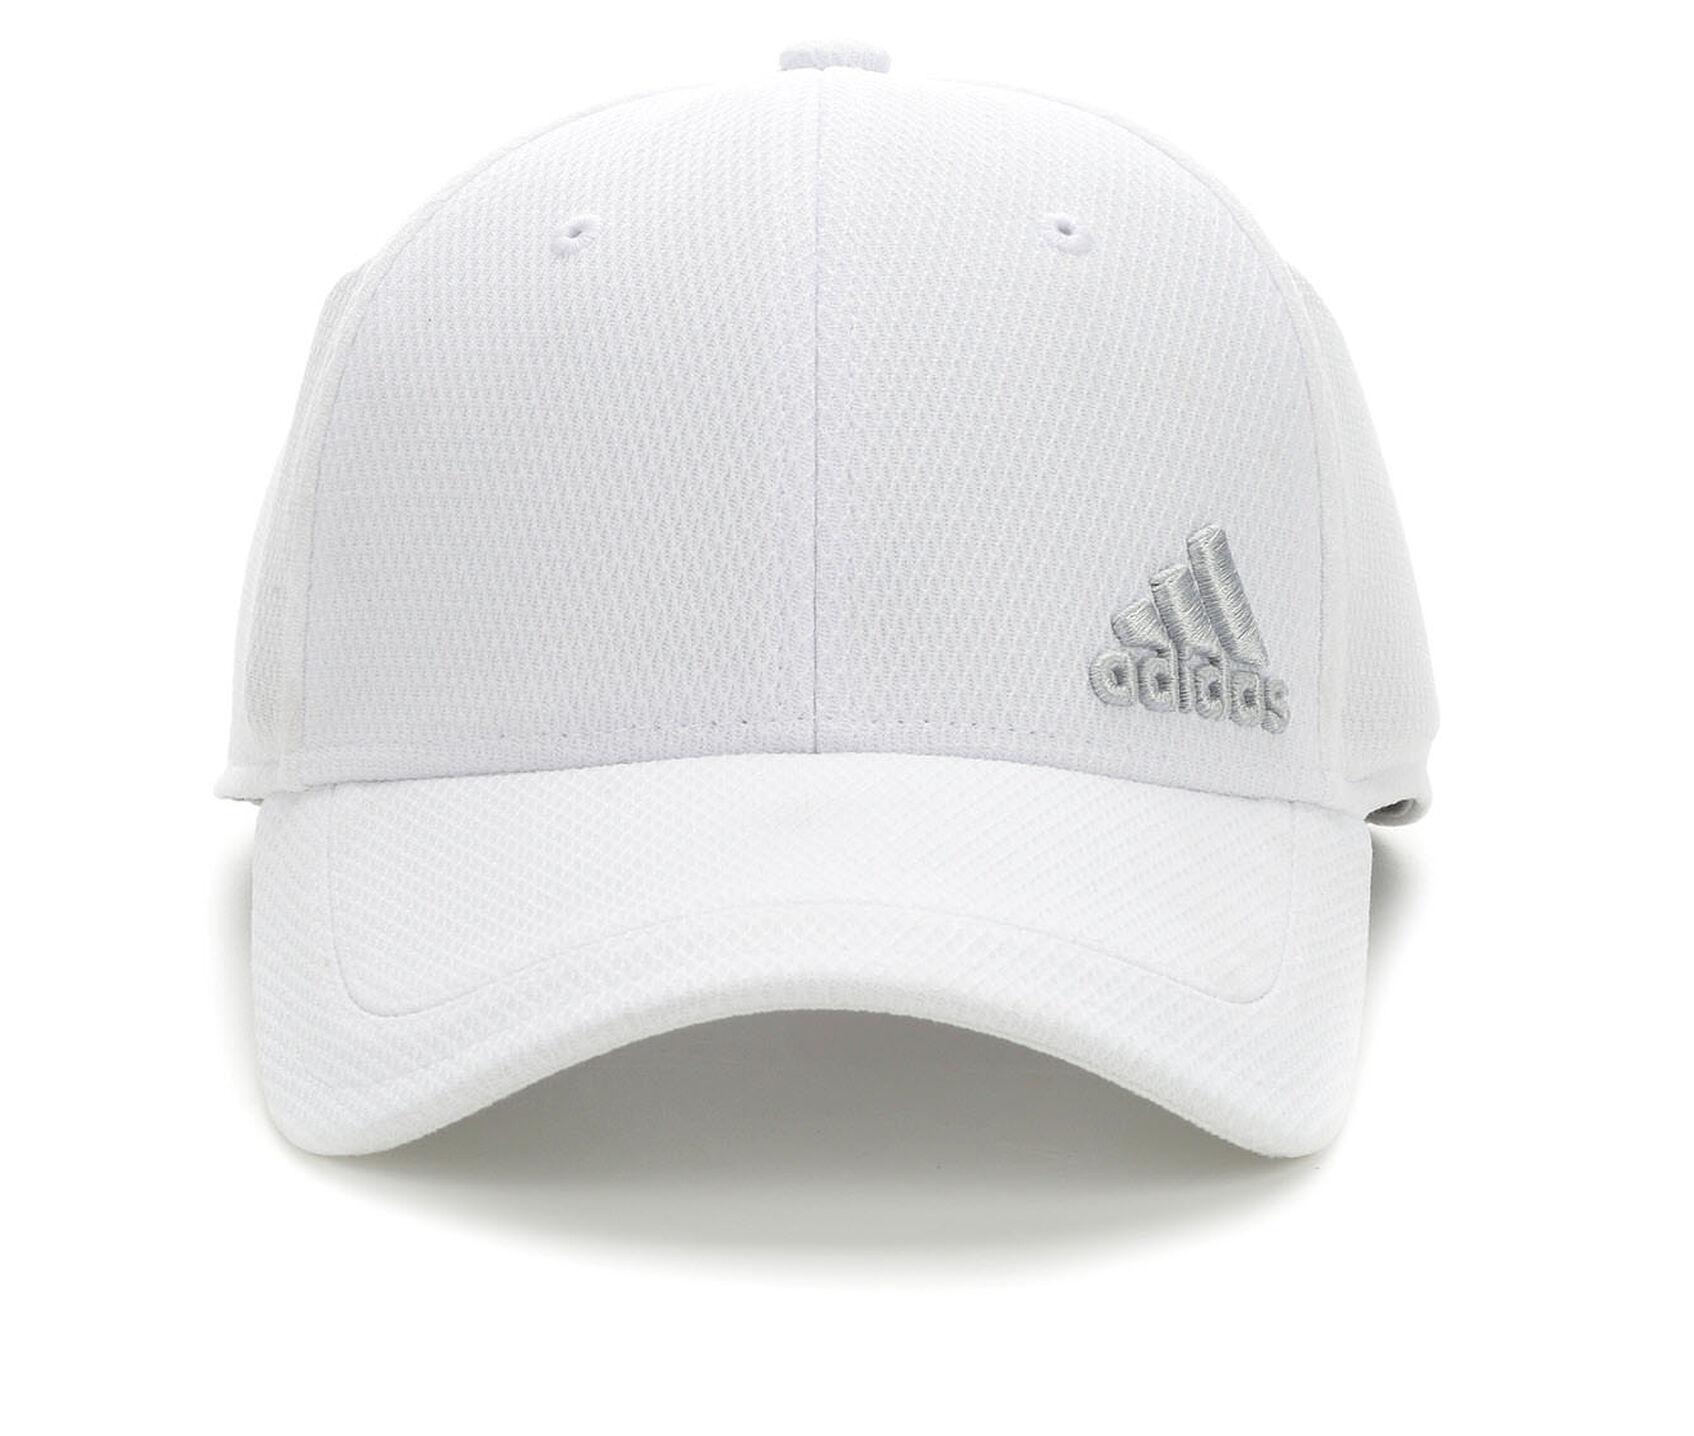 4efd8f1145e Adidas Men s Release Stretch Fit Baseball Cap